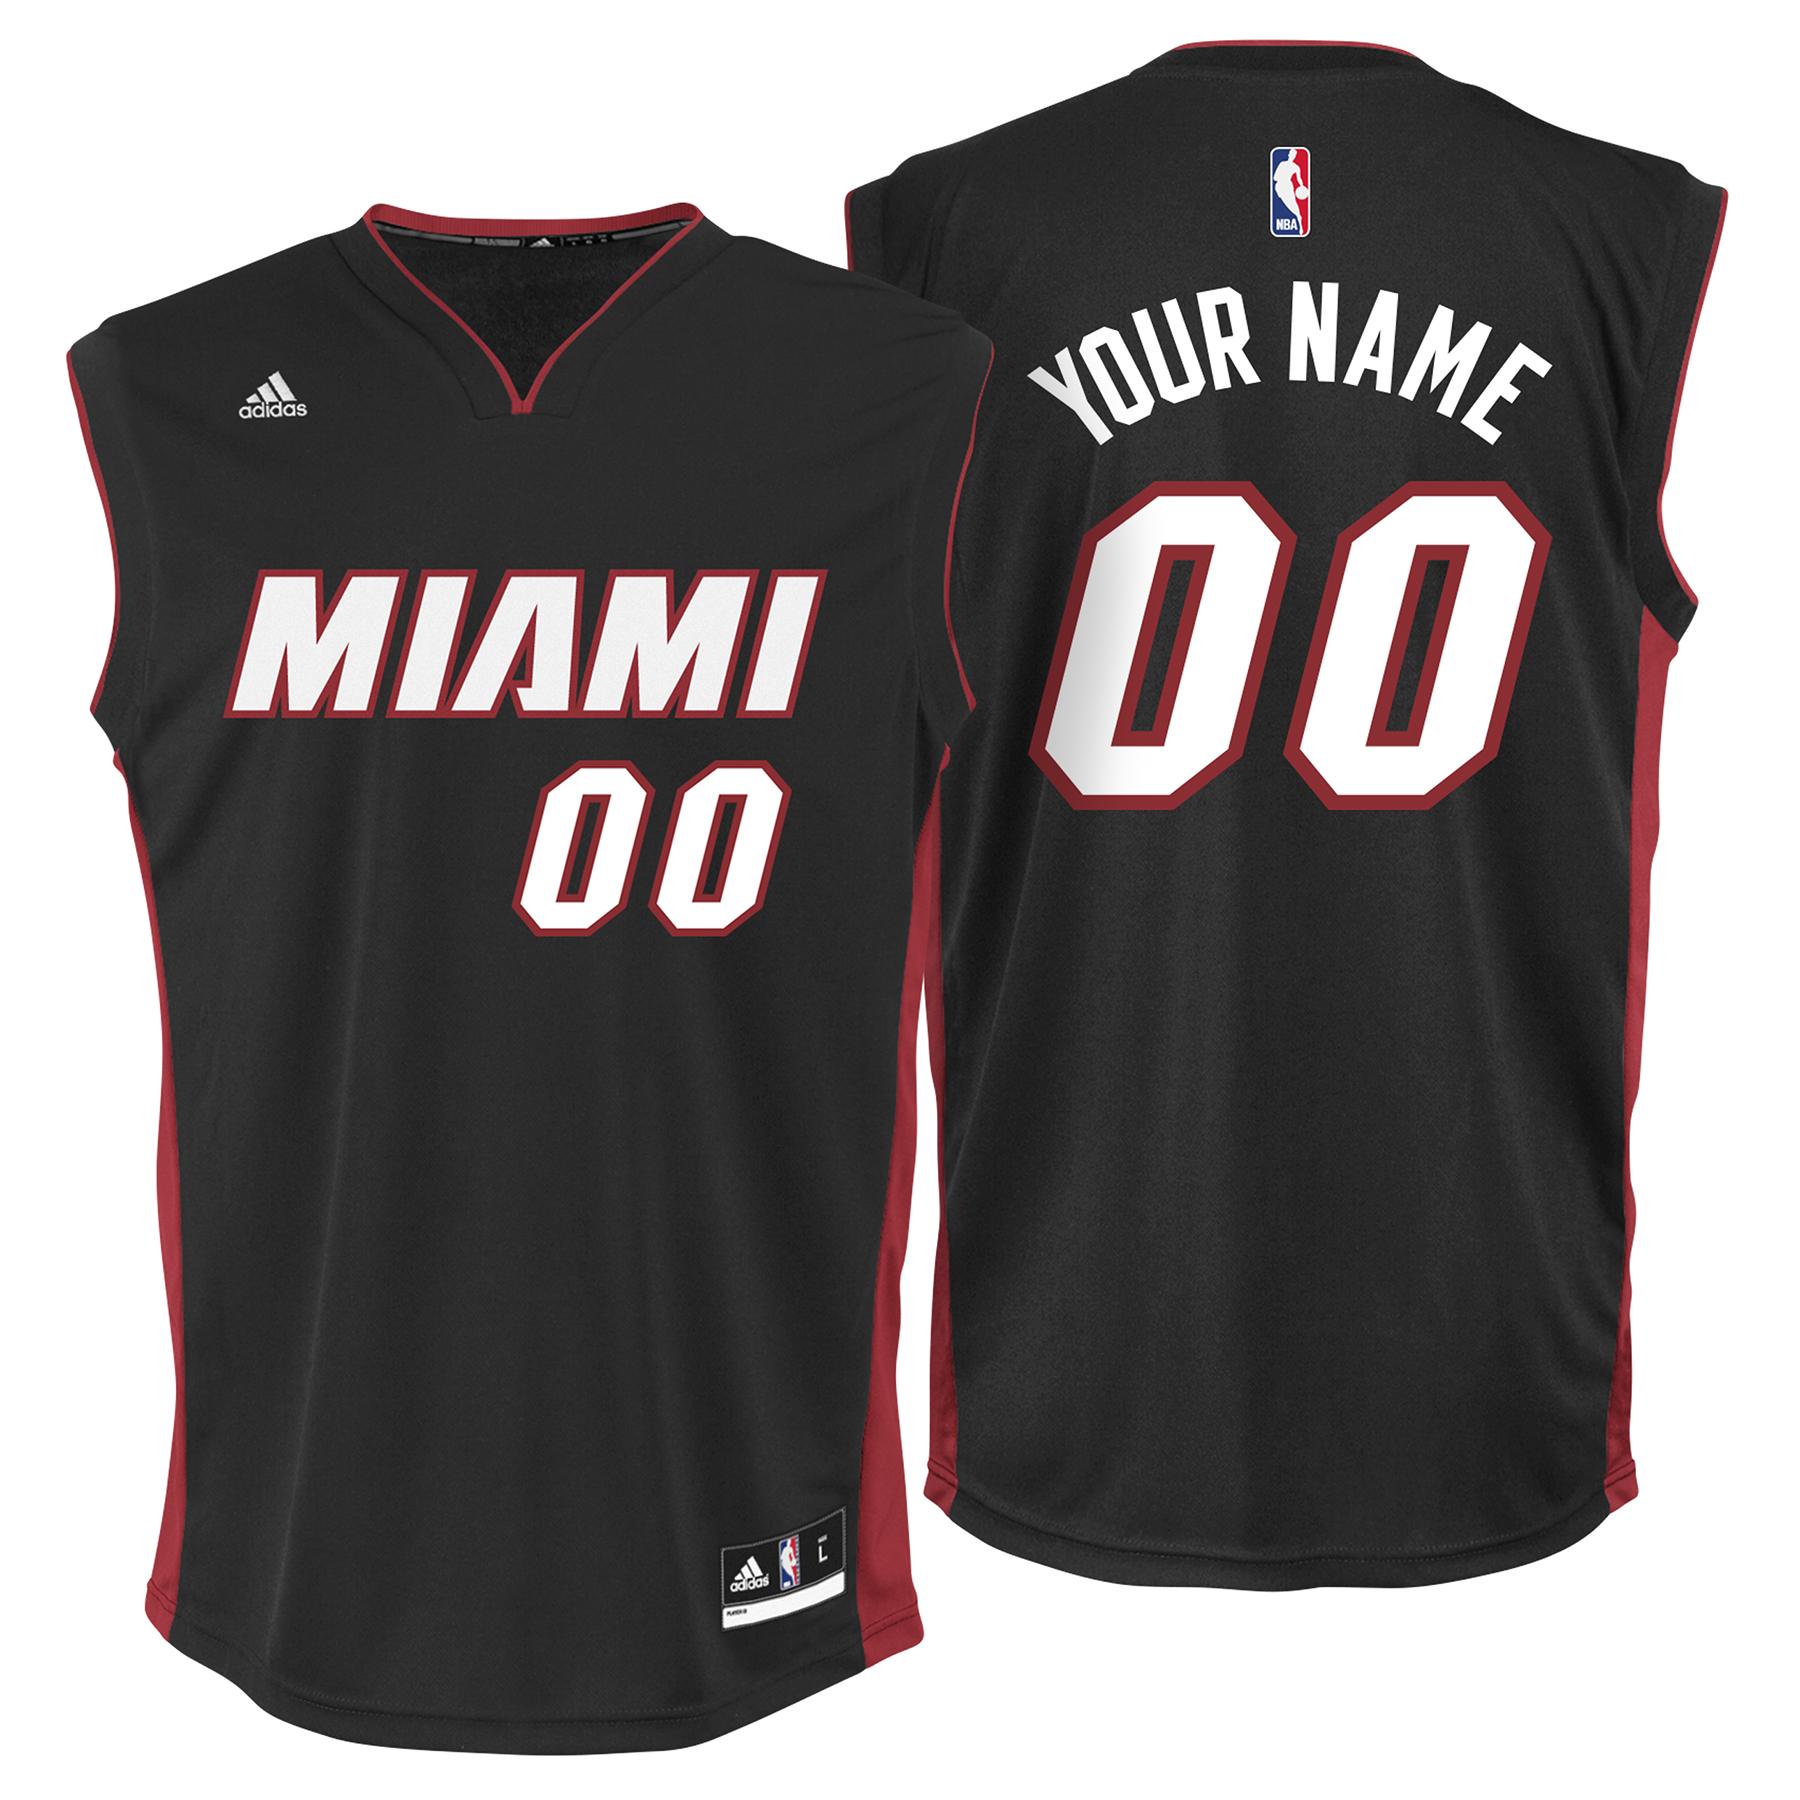 Miami Heat Road Replica Jersey - Custom - Youth